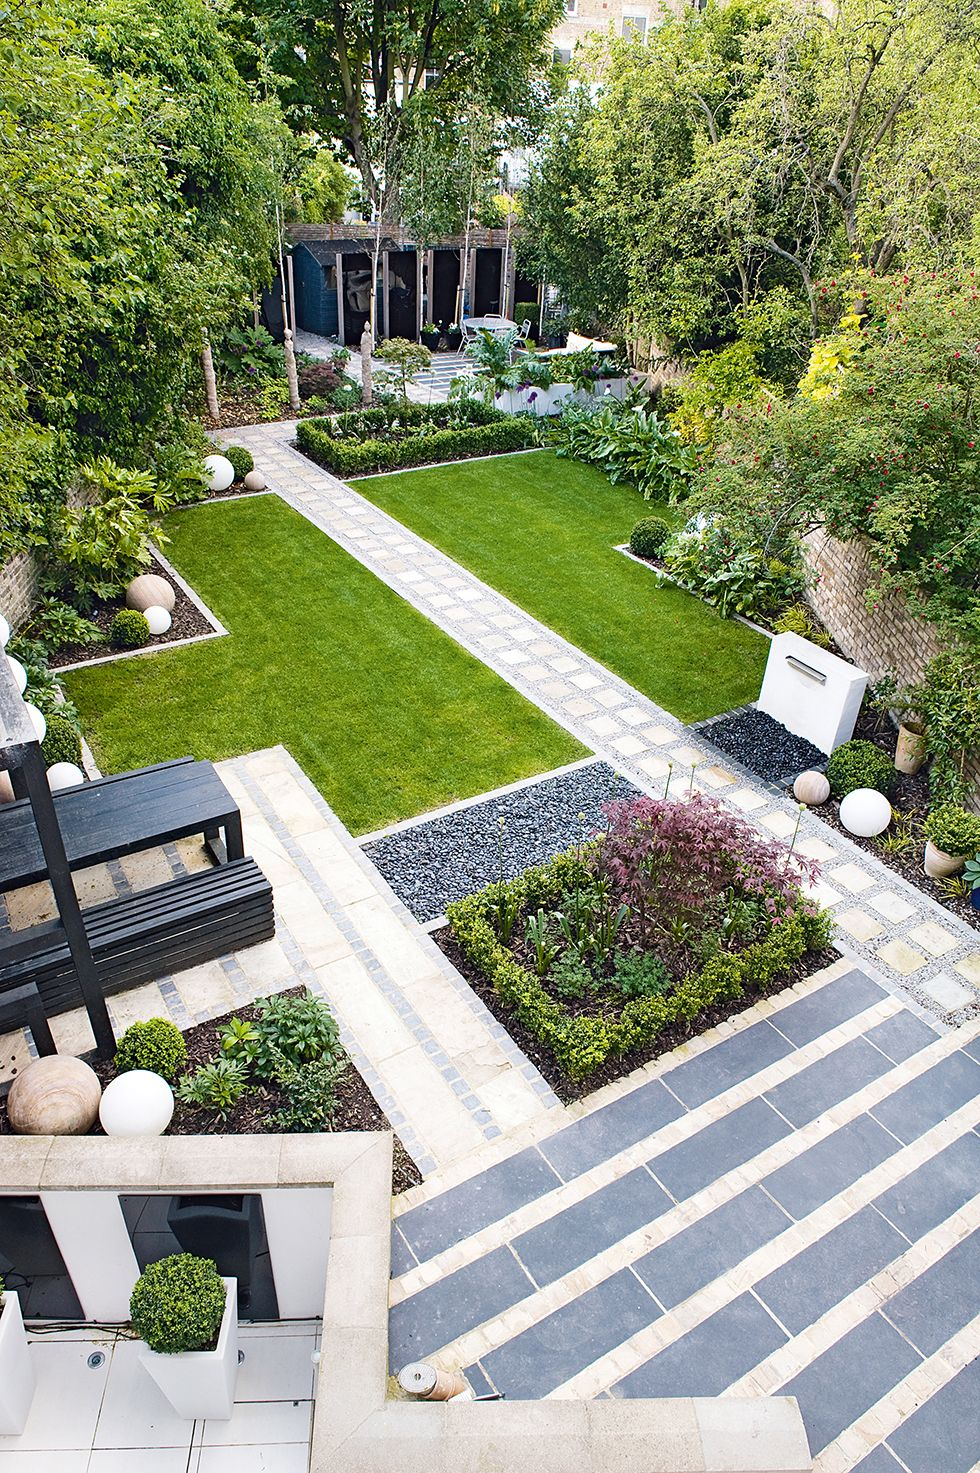 Diagonal Paving Garden Design Outdoor Yard Beautification